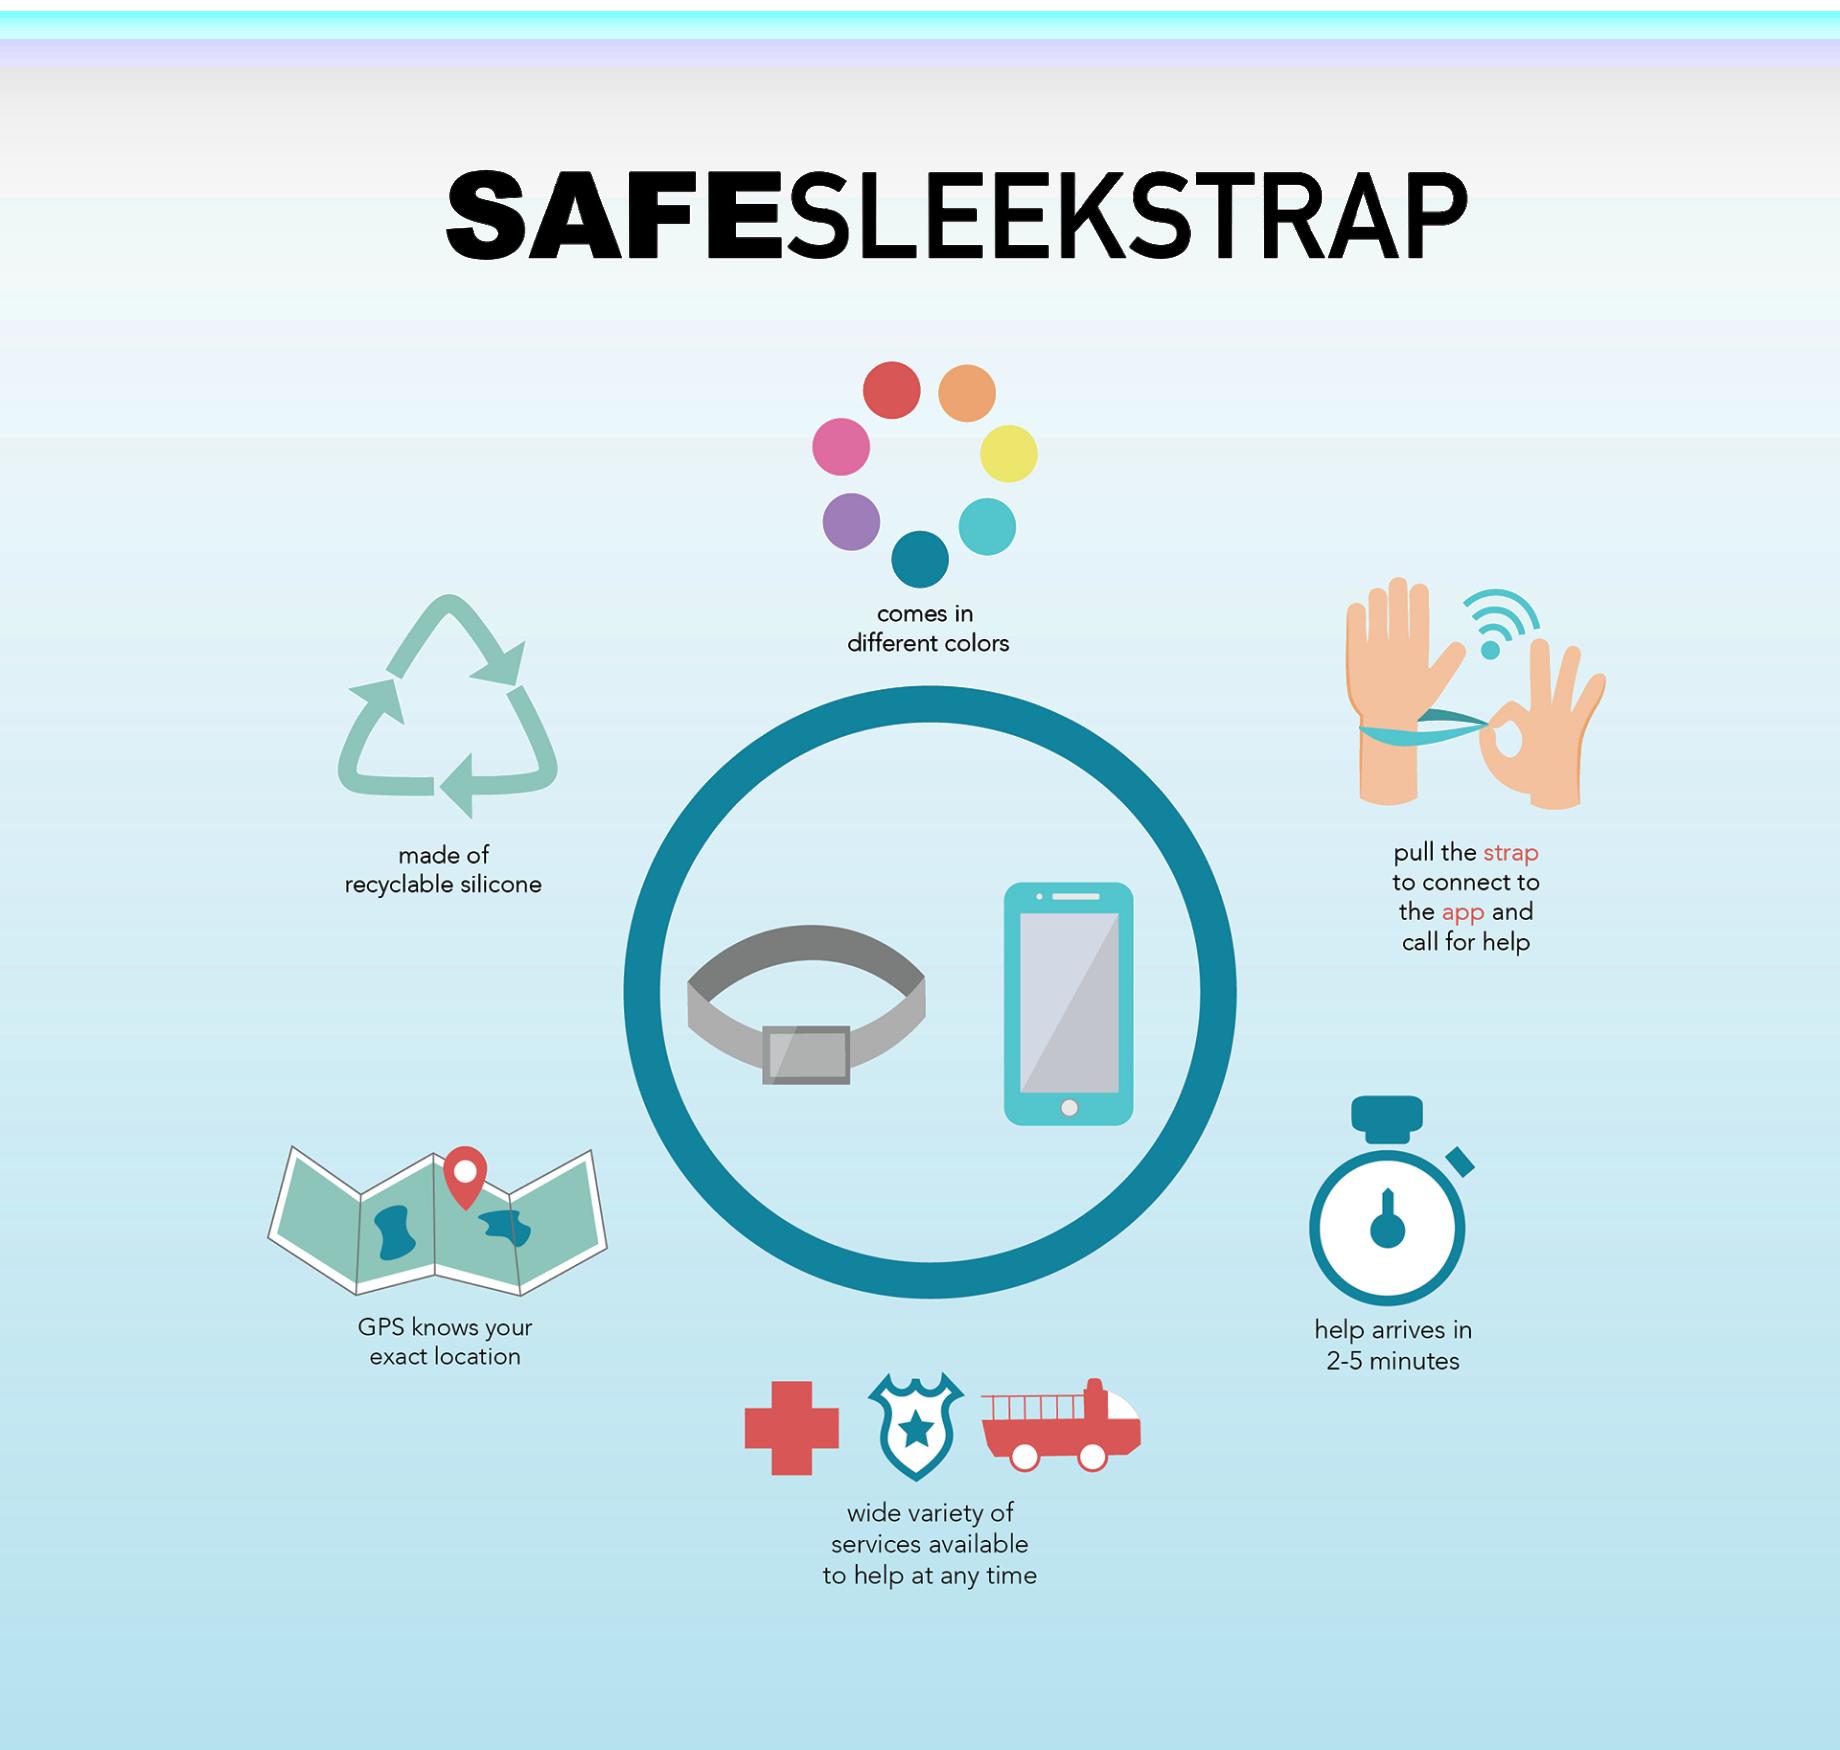 Safe Sleek Strap Infographic